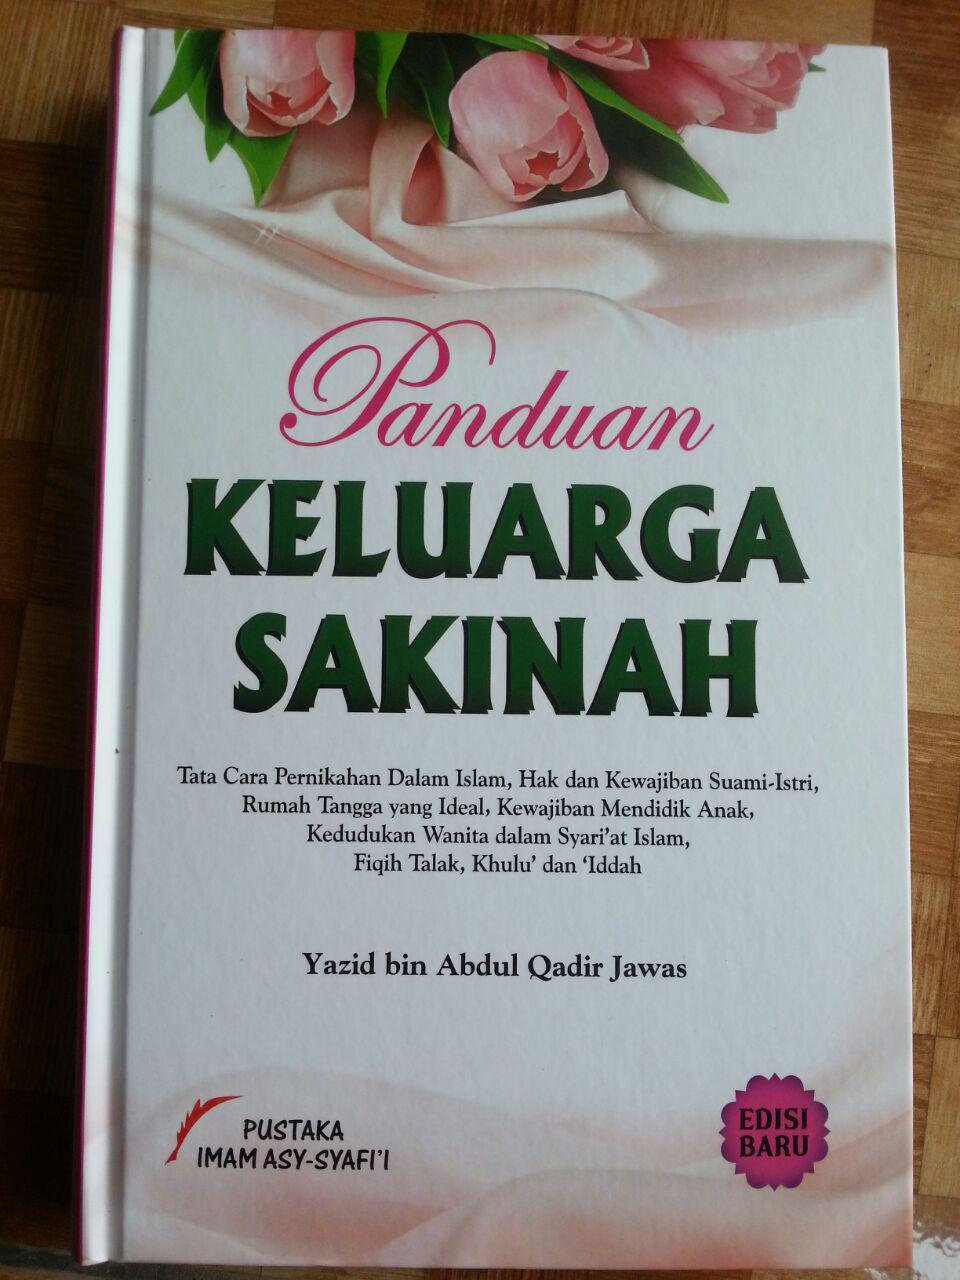 Buku Panduan Keluarga Sakinah cover 2